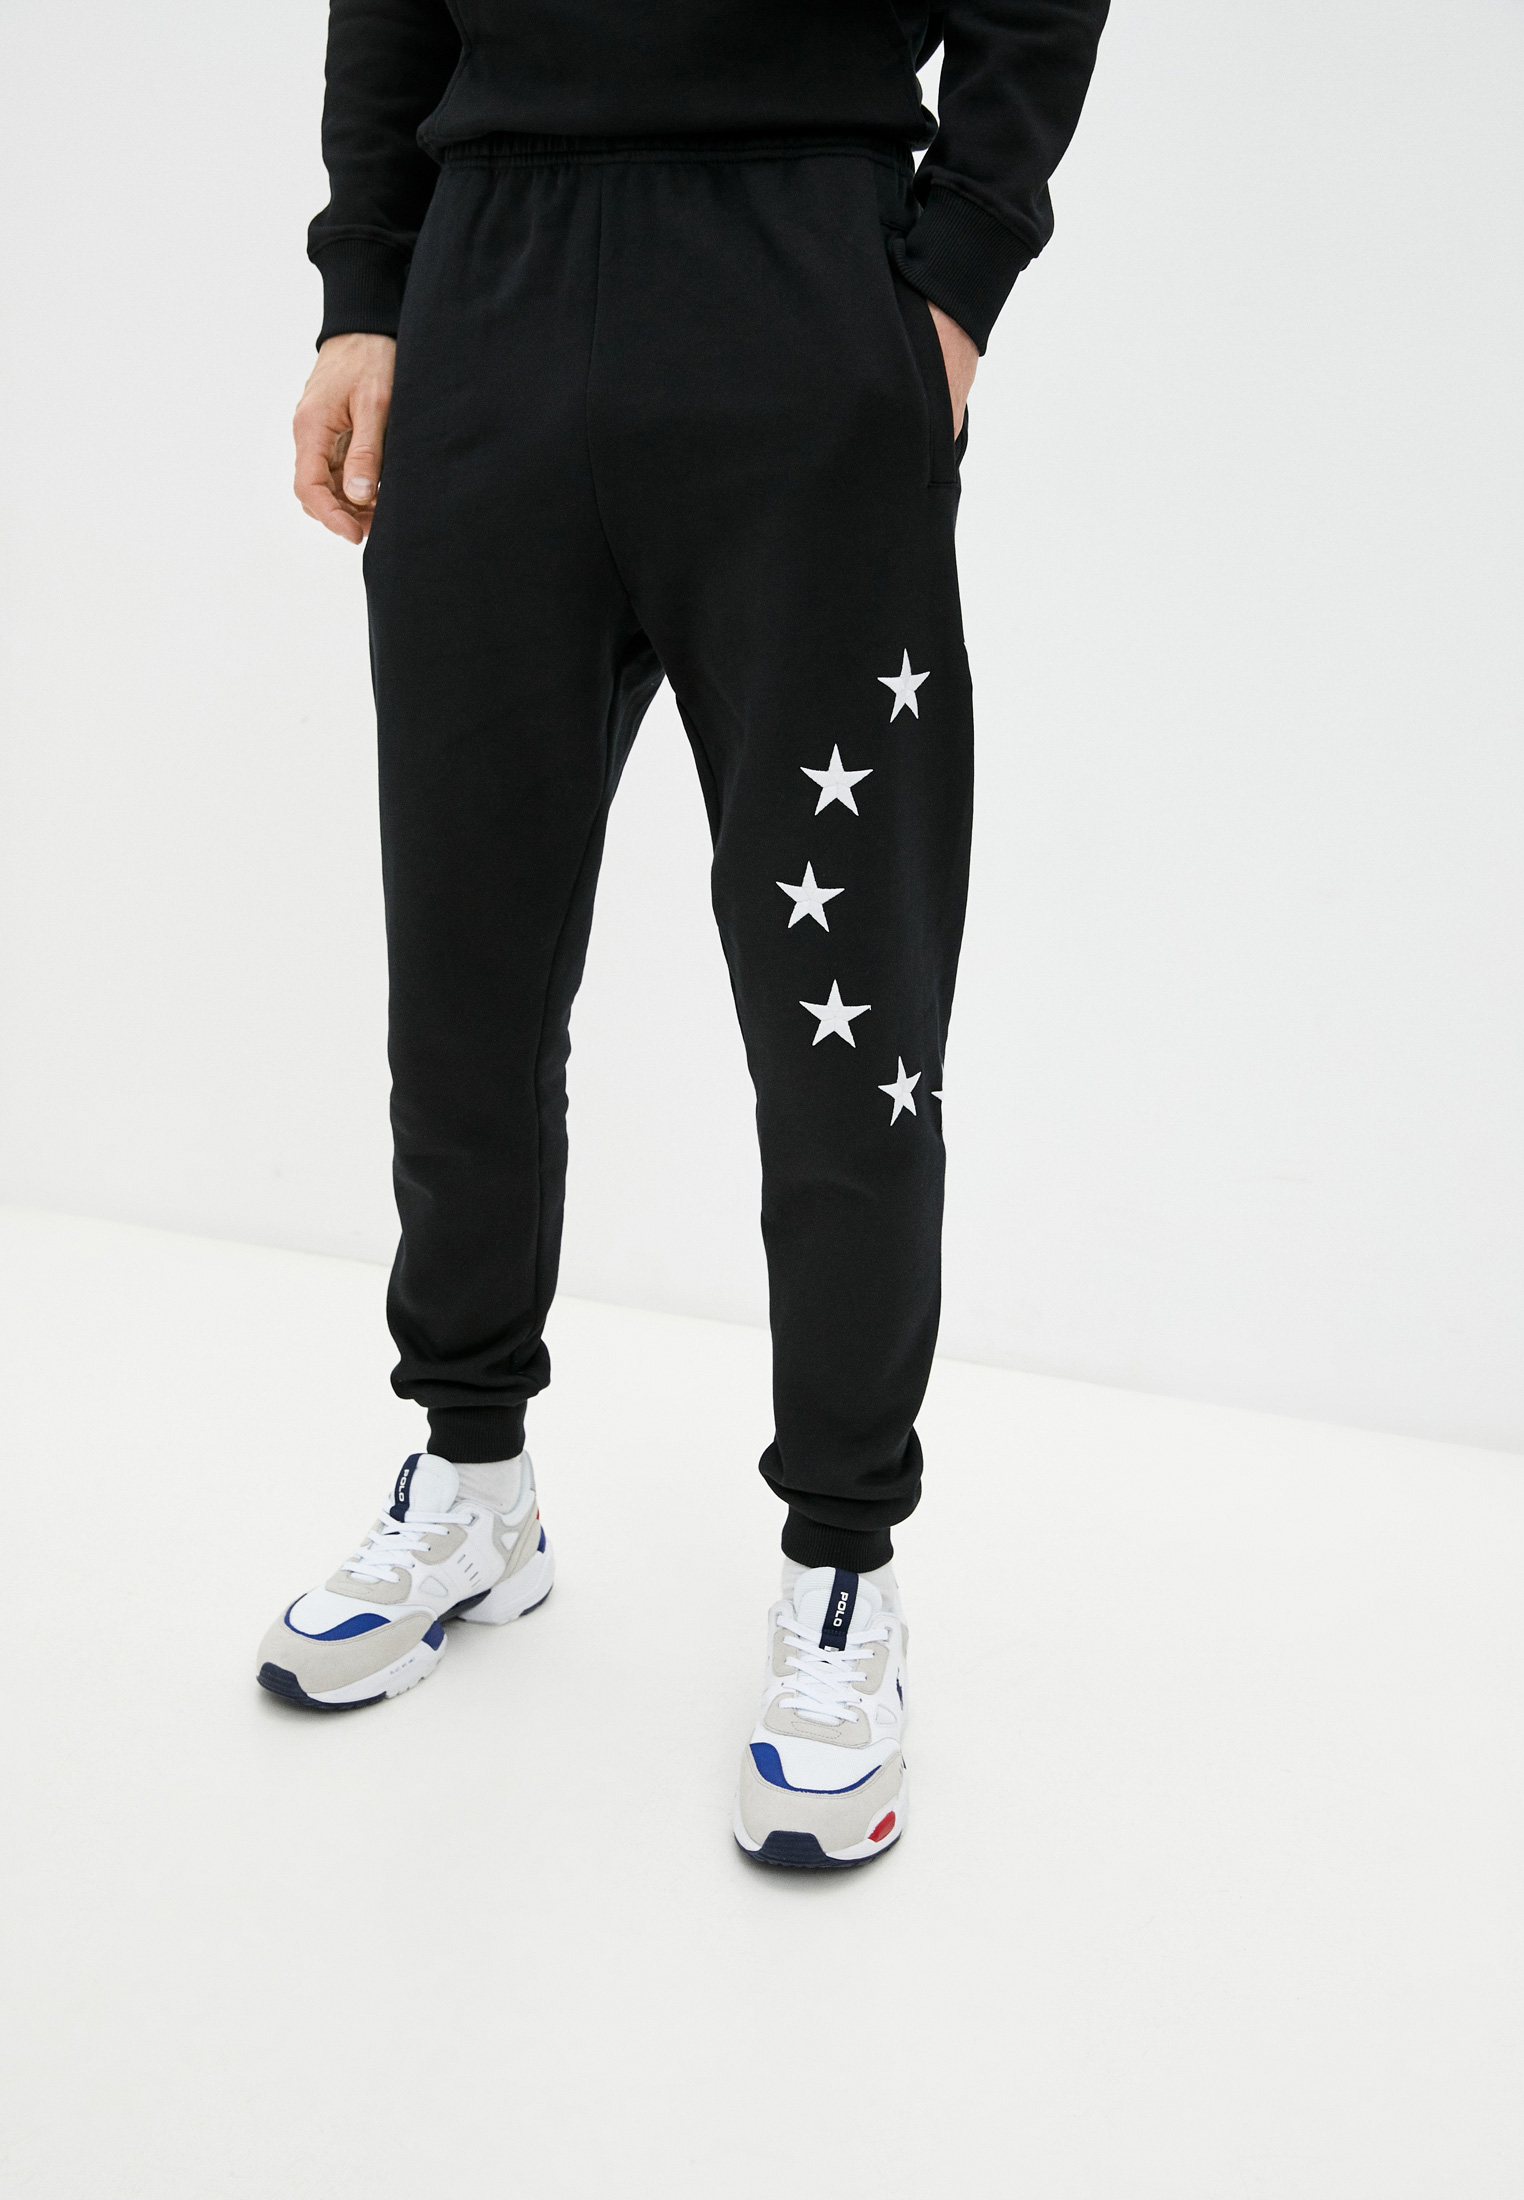 Мужские спортивные брюки Etudes E18E-602-01